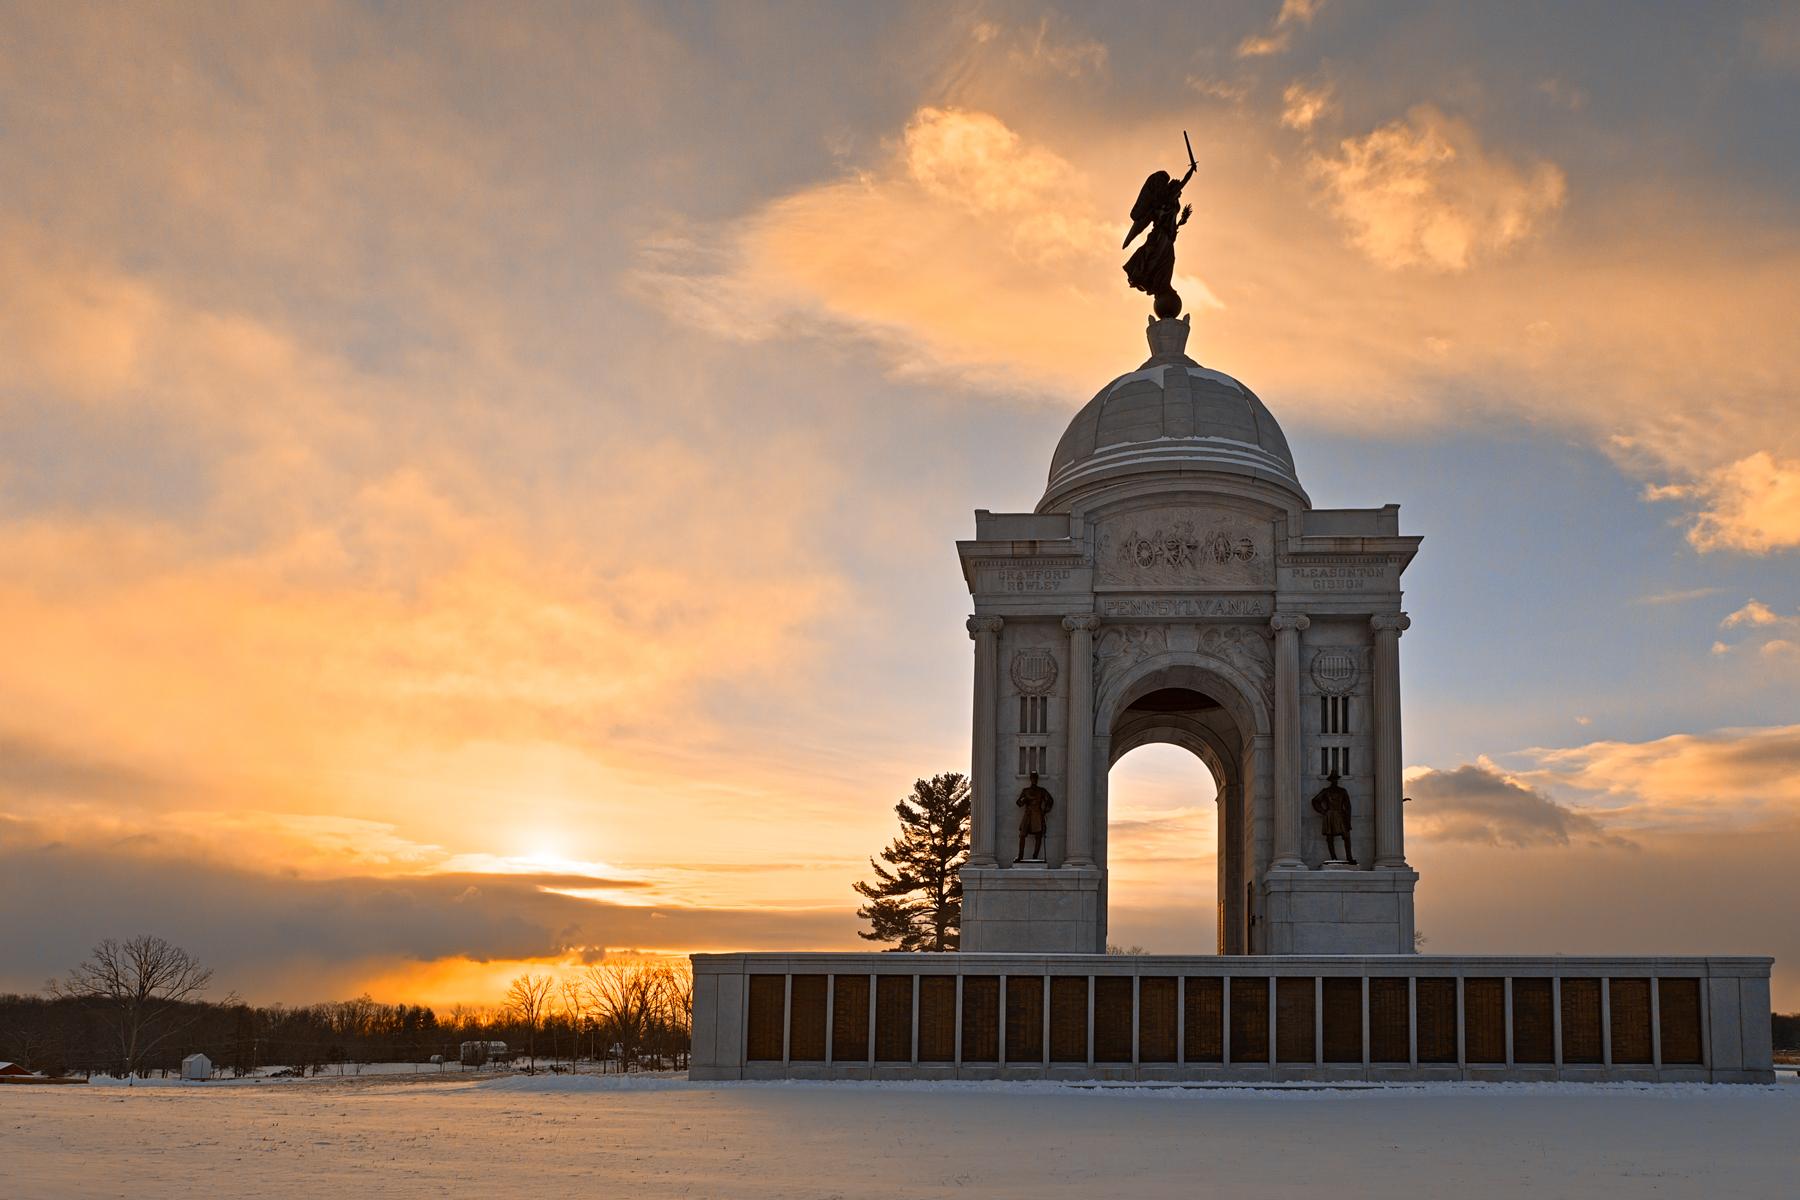 Winter gettysburg sunrise - hdr photo